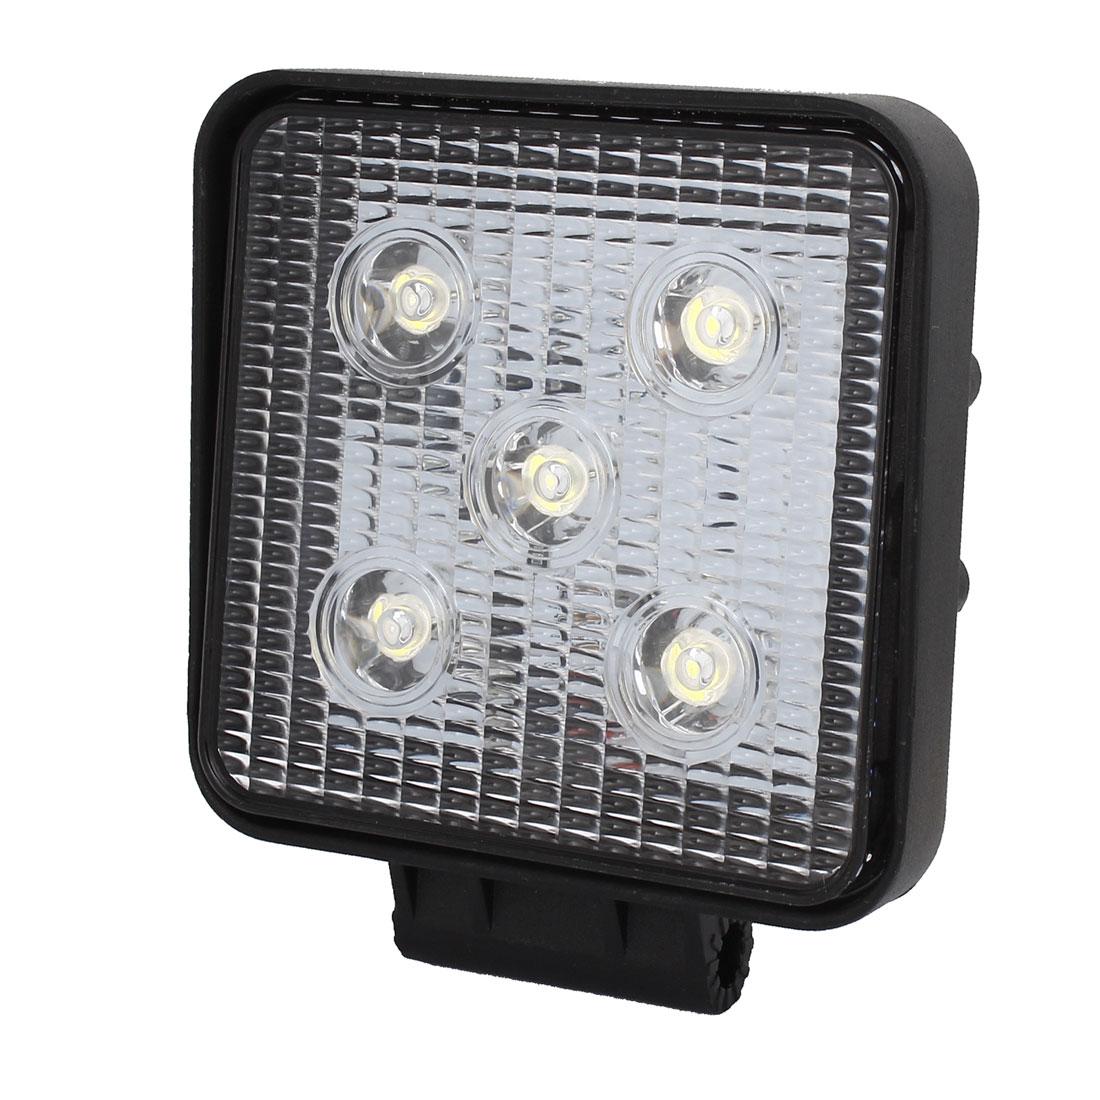 Black Metal Square Housing 15W Spot Beam 5 LED Work Light Driving Lamp Offroad SUV ATV DC 12V